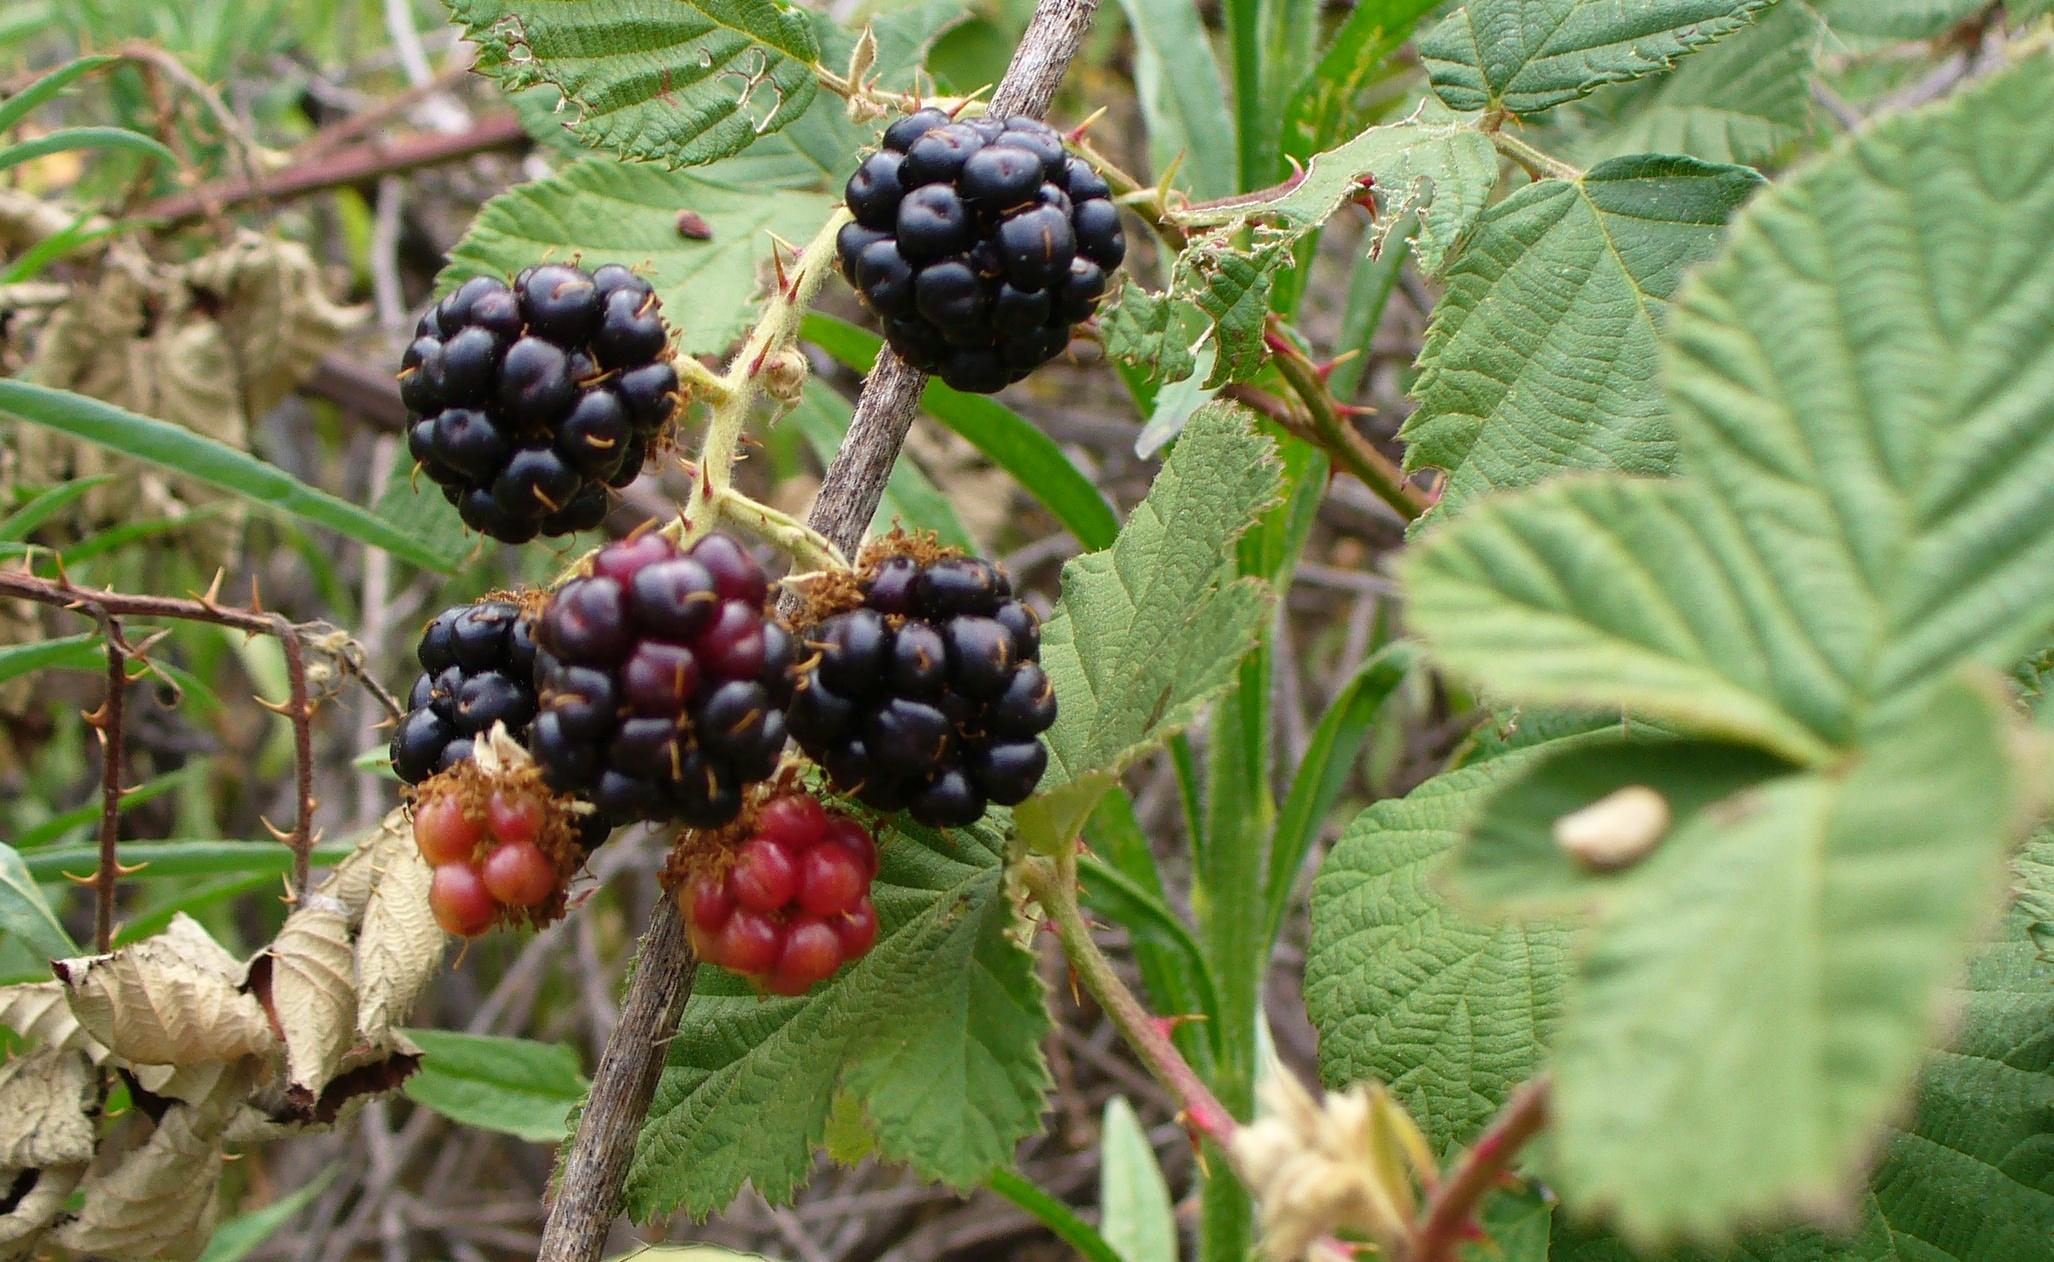 blackberries-sac_river-20190629-42